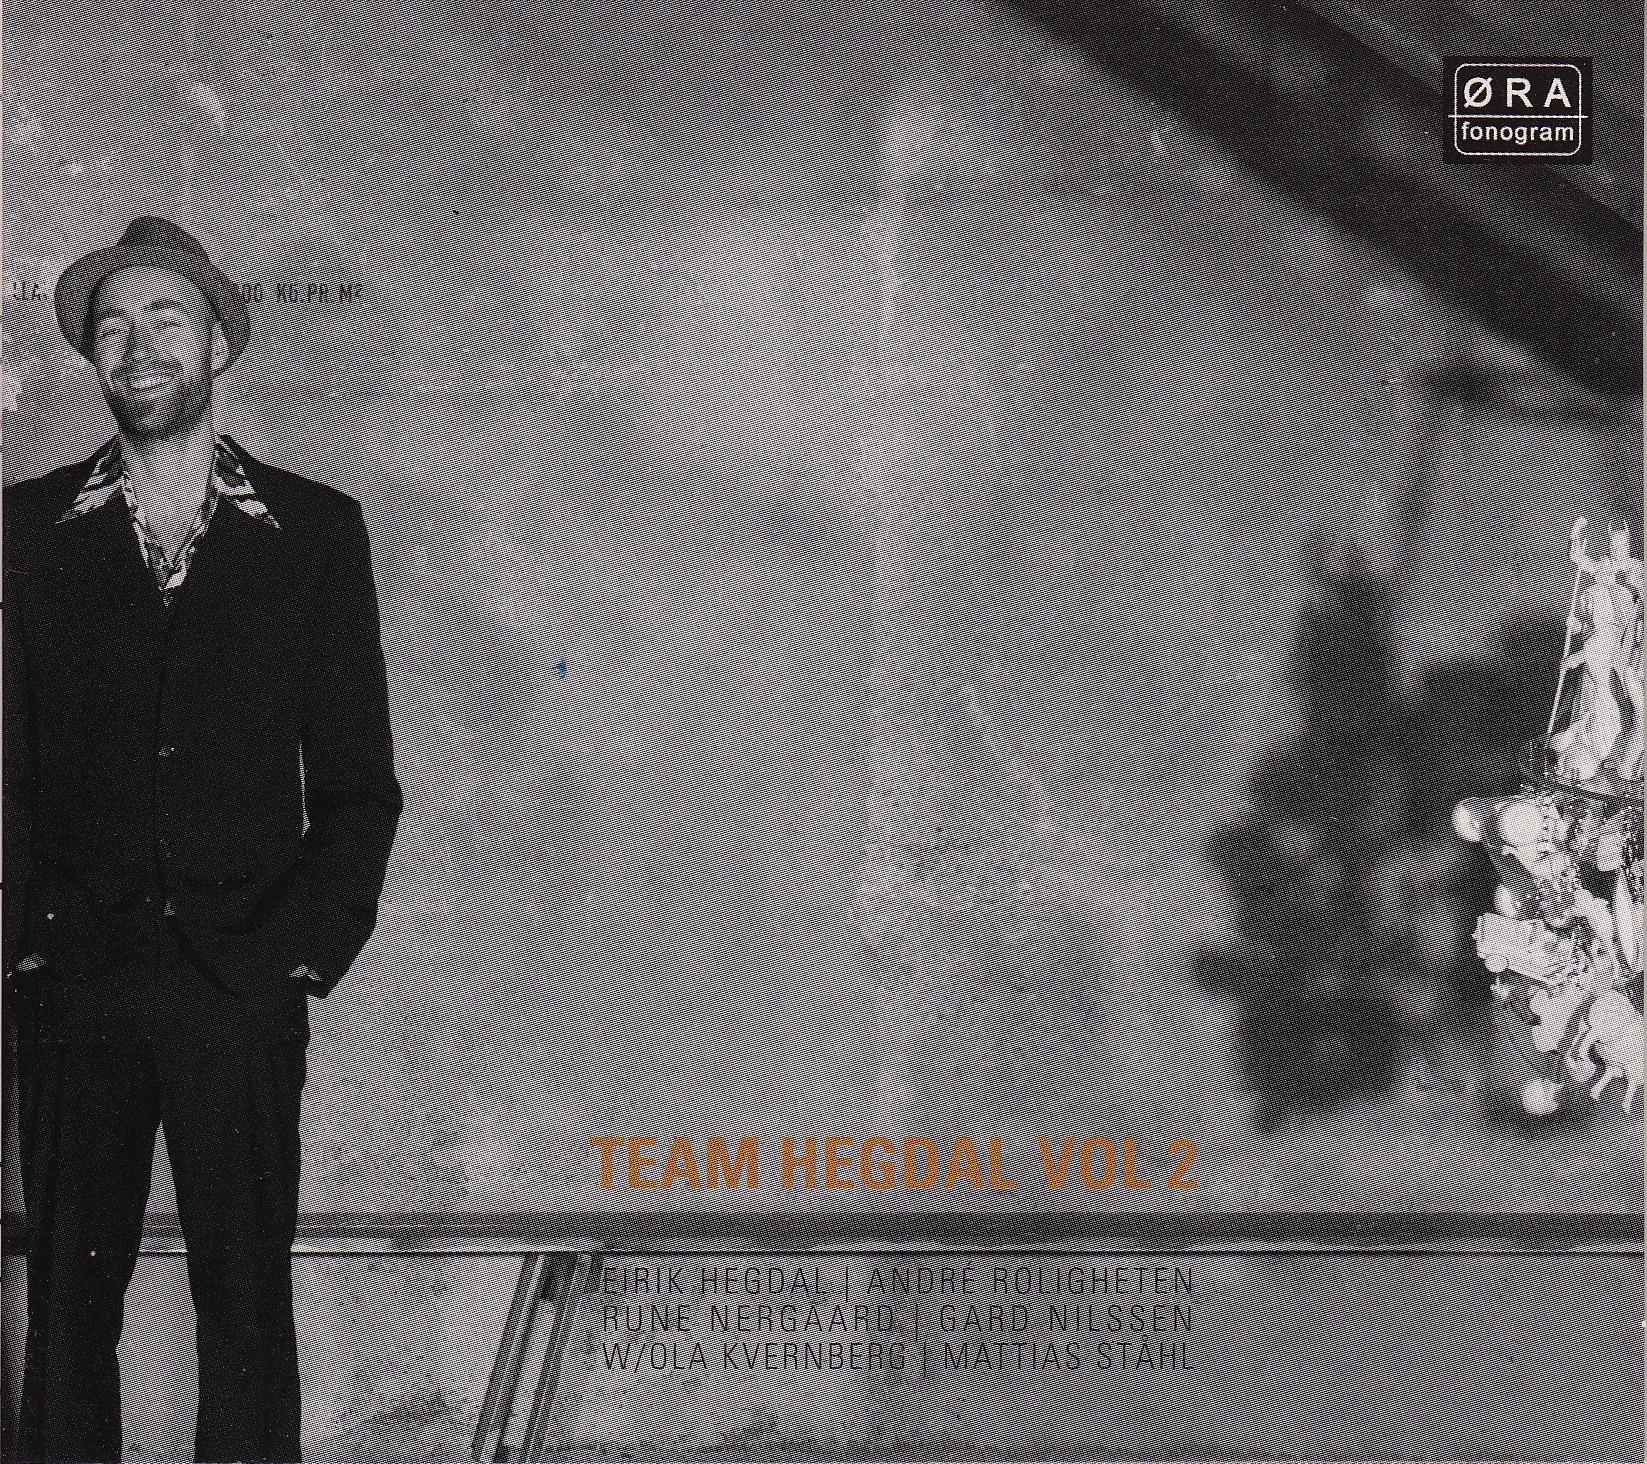 Team Hegdal - Vol 2